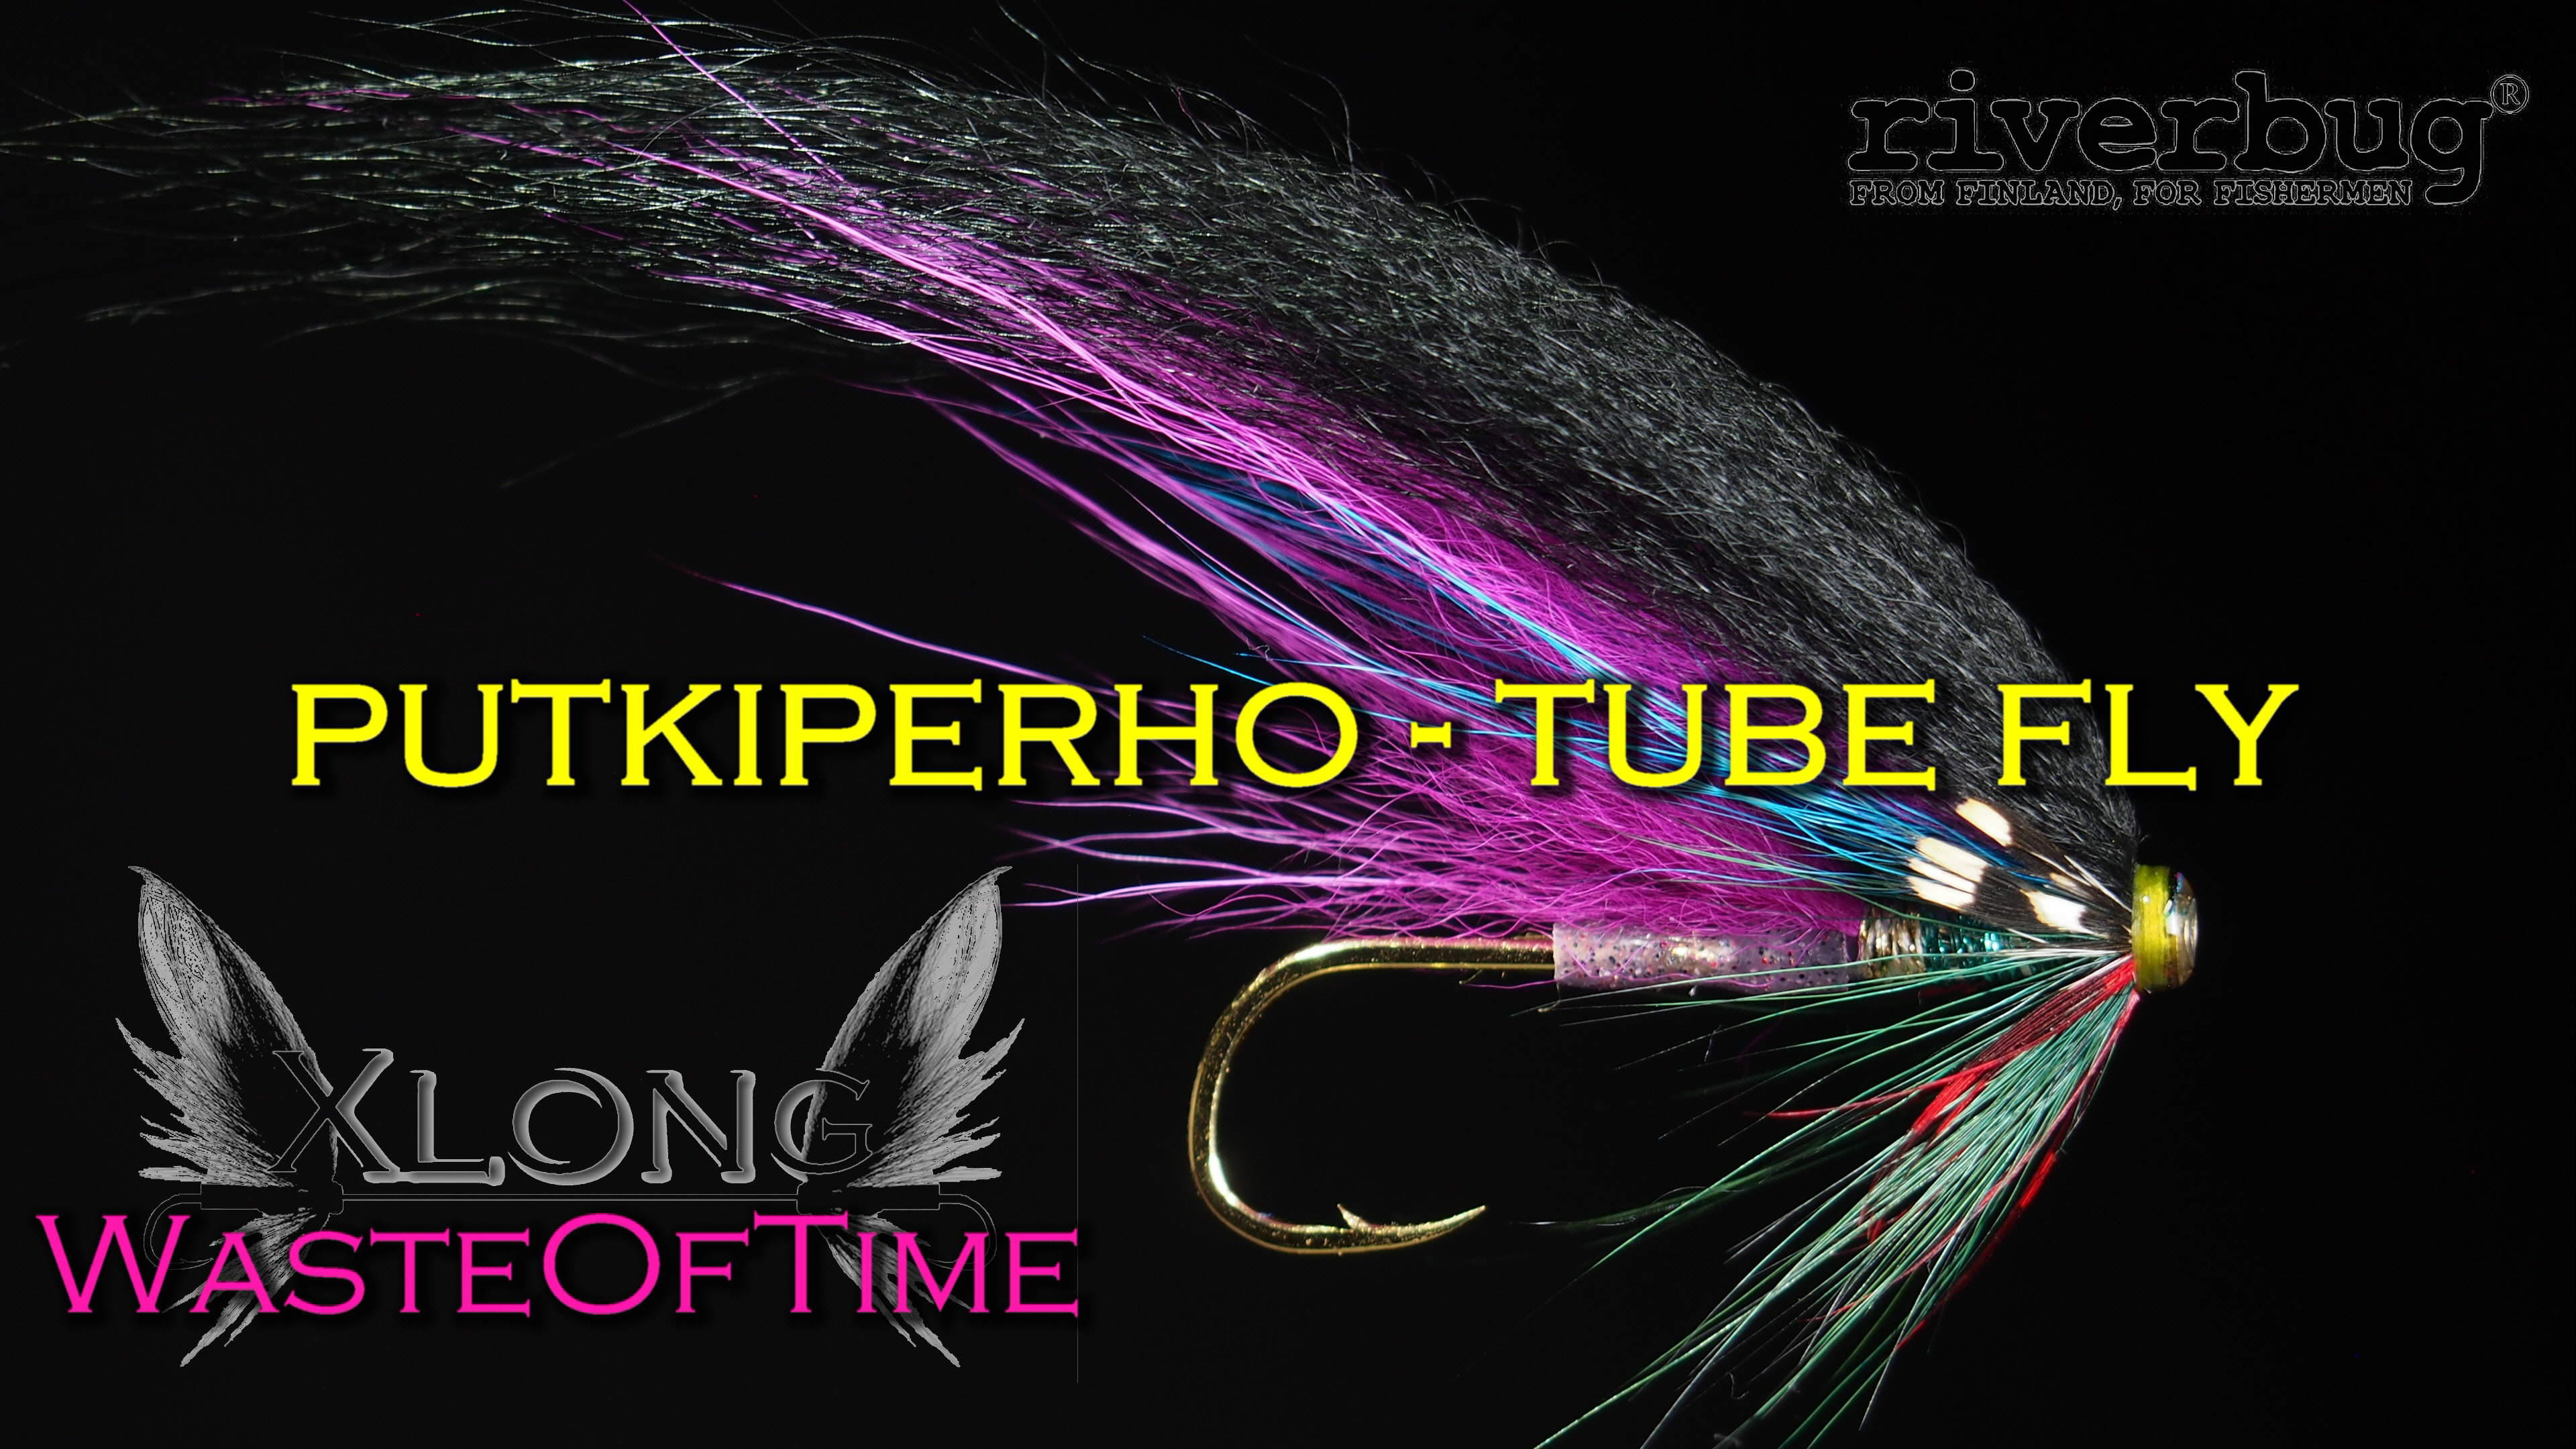 RiverTube - Putkiperho - Tube Fly